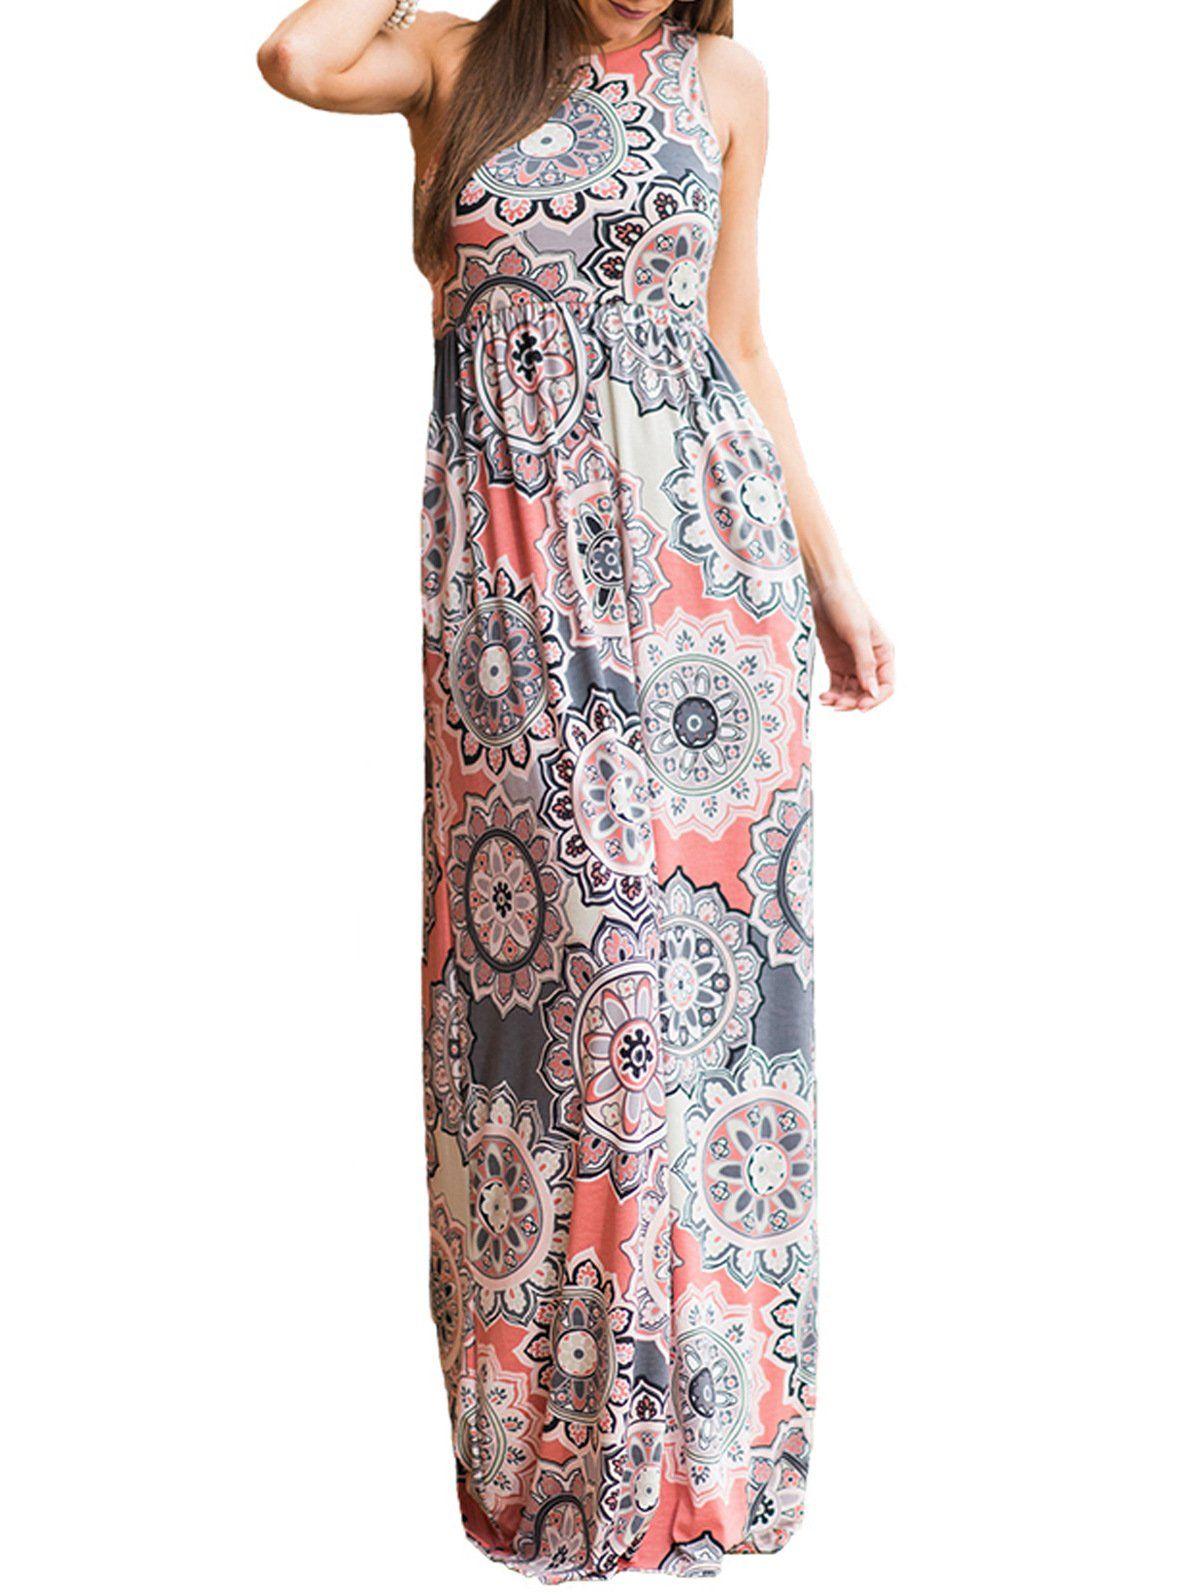 Swqzvt Women S Summer Bohemian Floral Dresses Sleeveless Pockets Racerback Scoop Neck Casual Long Maxi T Long Dress Casual Maxi Dress Empire Waist Dress Casual [ 1596 x 1200 Pixel ]